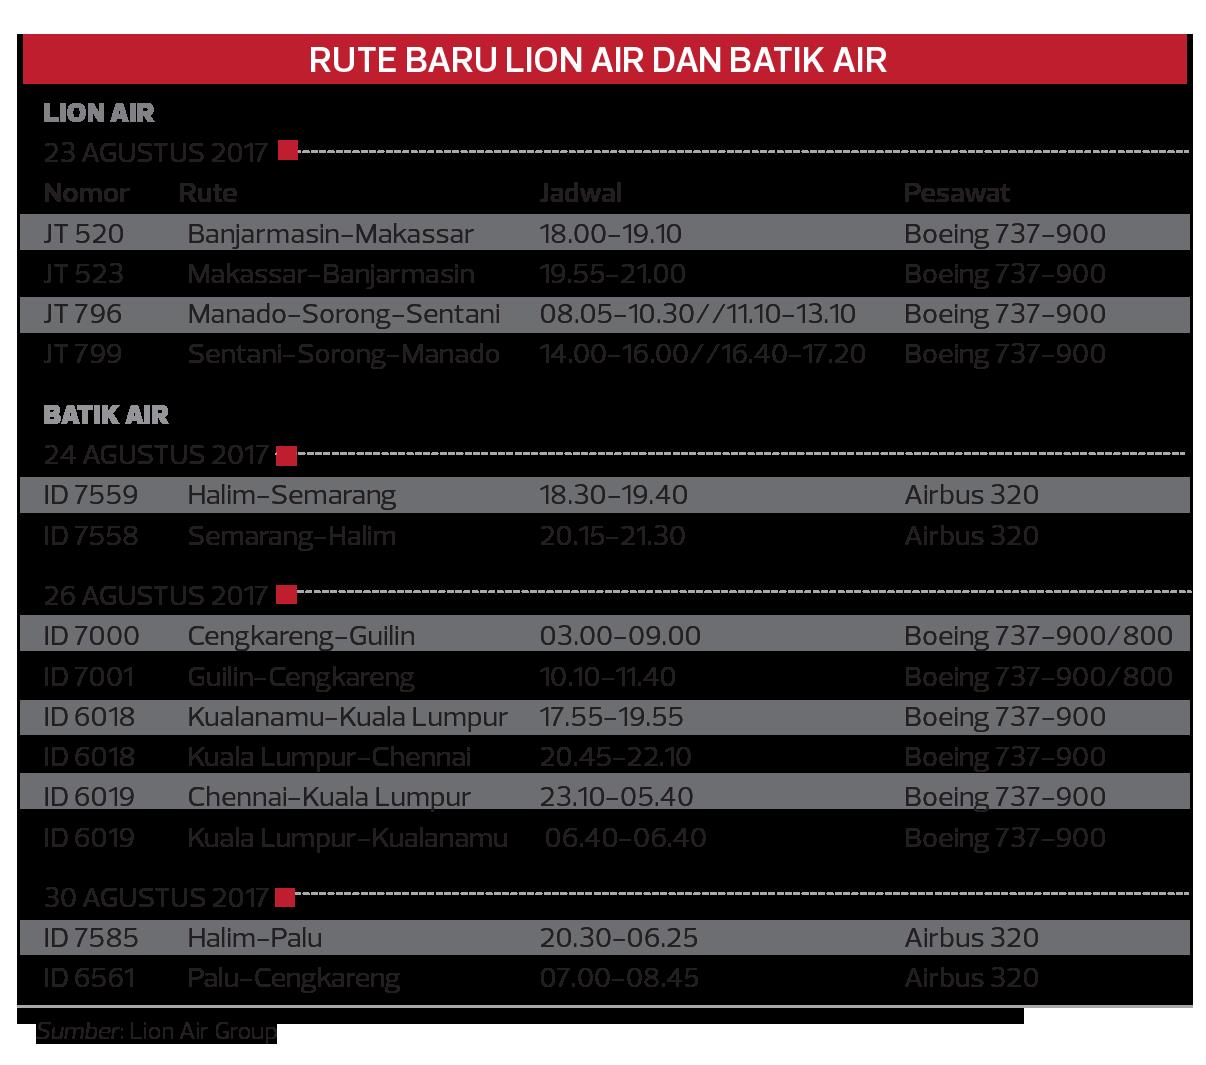 Rute Baru Lion Air dan Batik Air